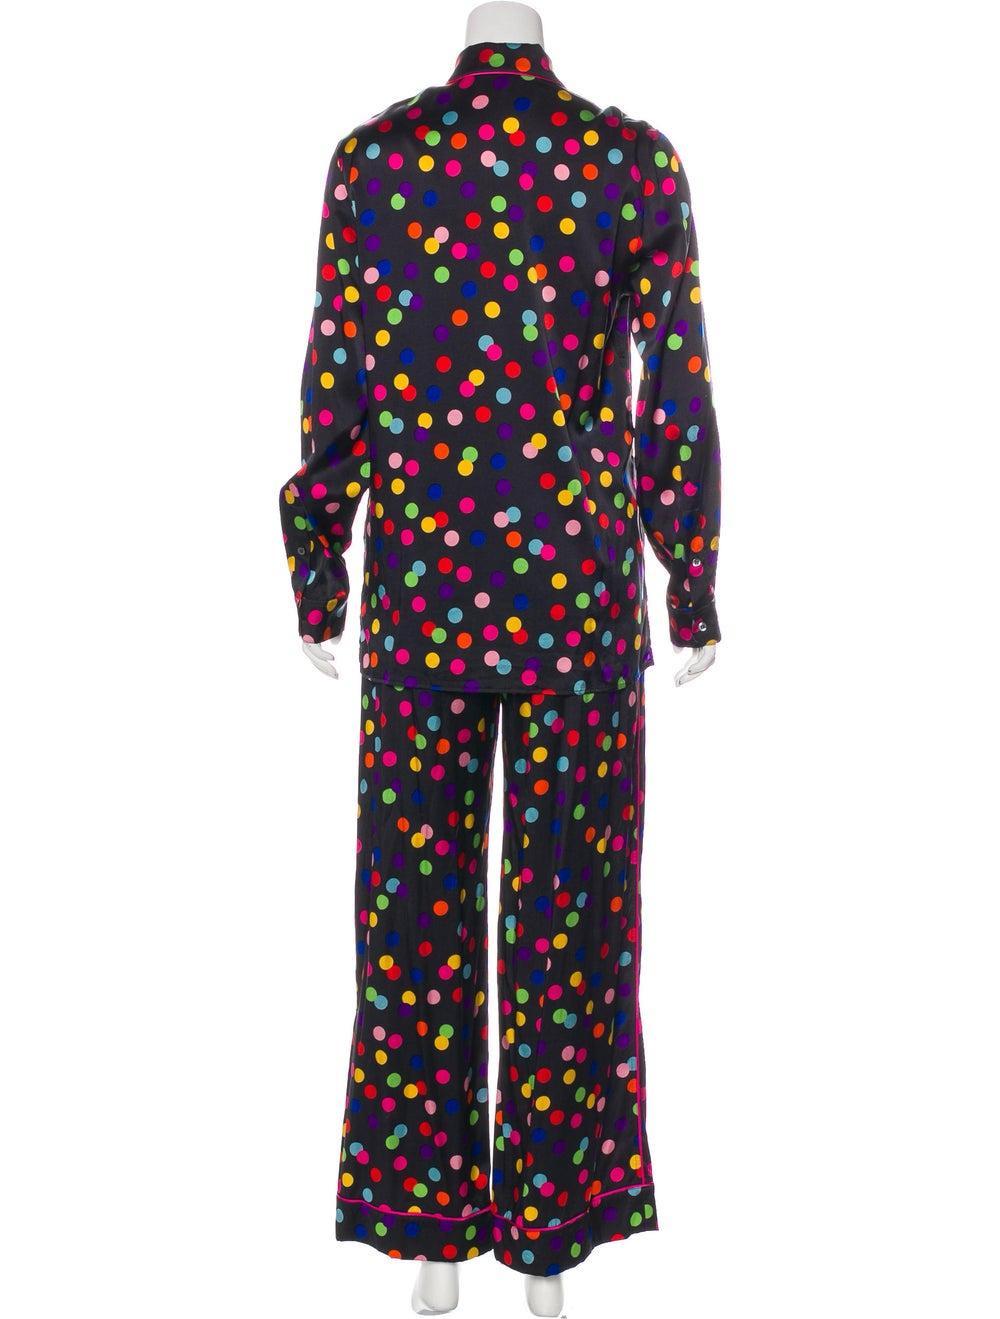 Dolce & Gabbana Polka Dot Silk Pajama Set Black - image 3